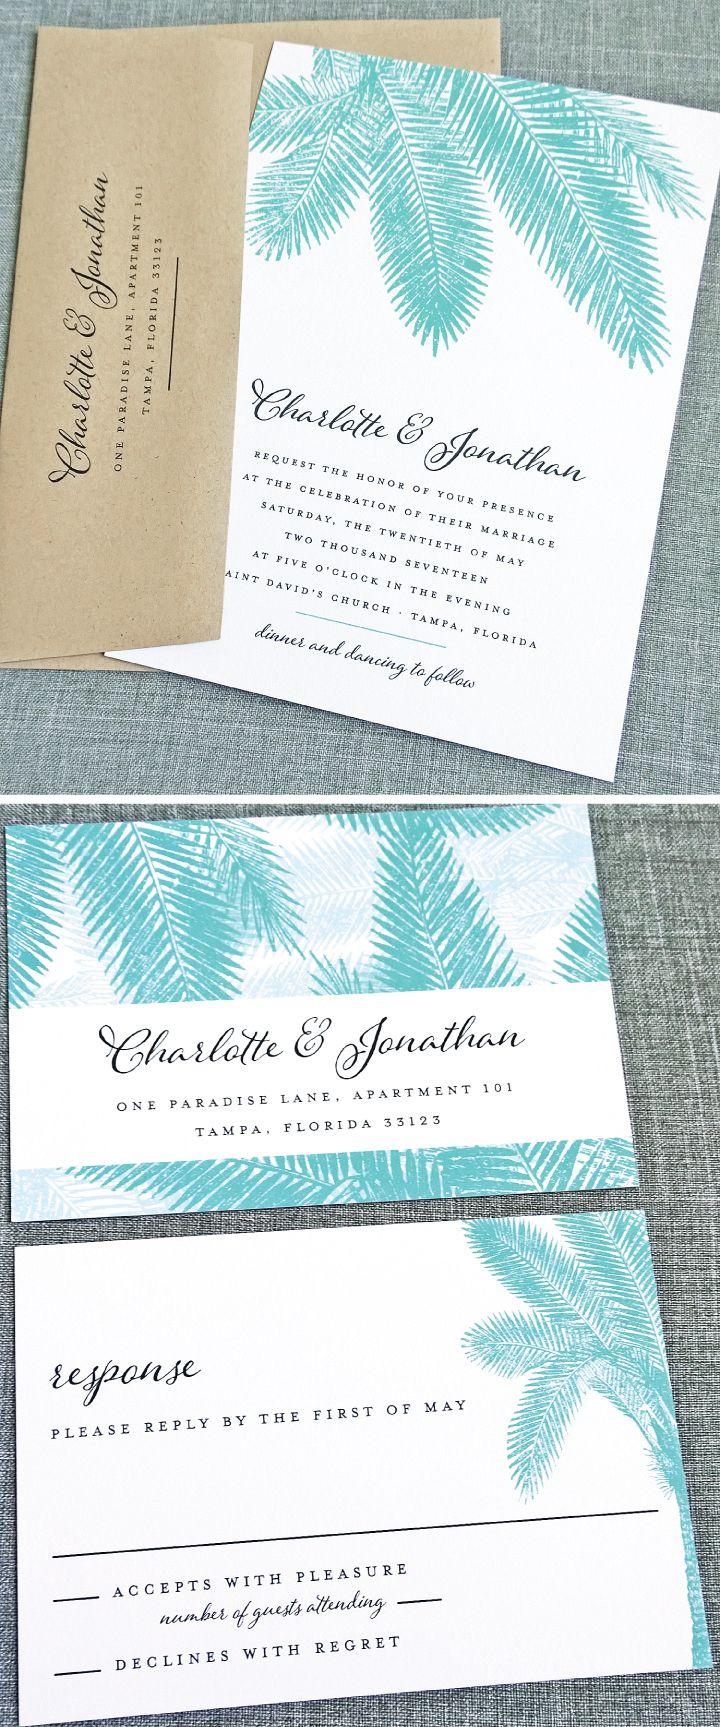 67 best Beautiful Invitations images on Pinterest | Wedding ...